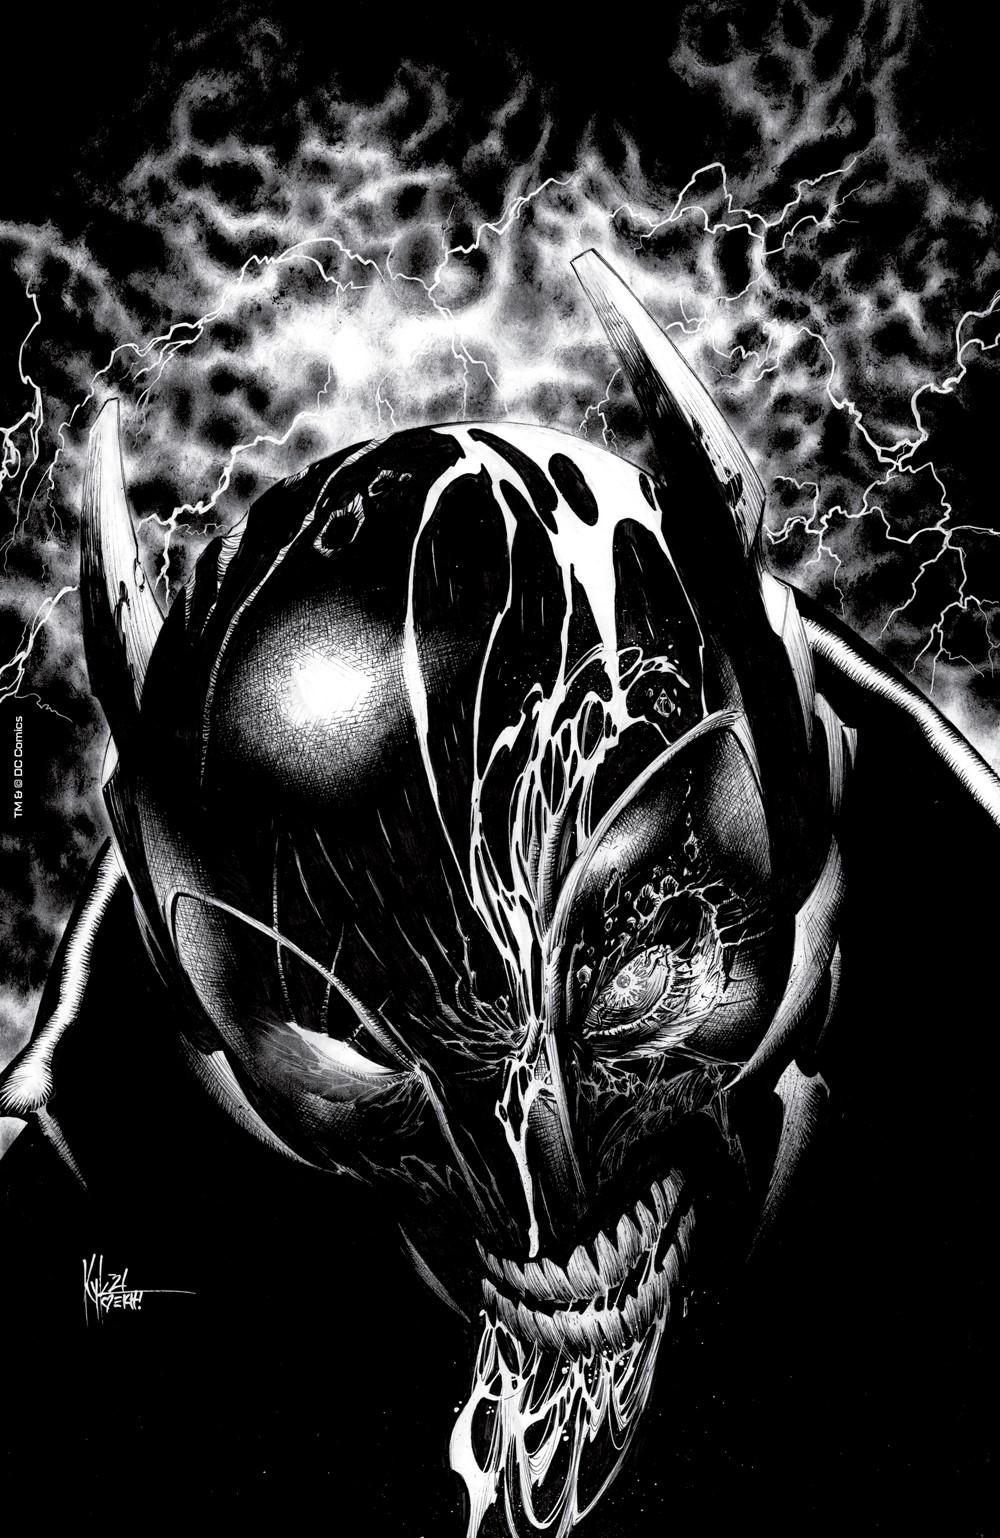 TFZ_Cv1_1in100_MONOFOIL_var_00161 DC Comics October 2021 Solicitations